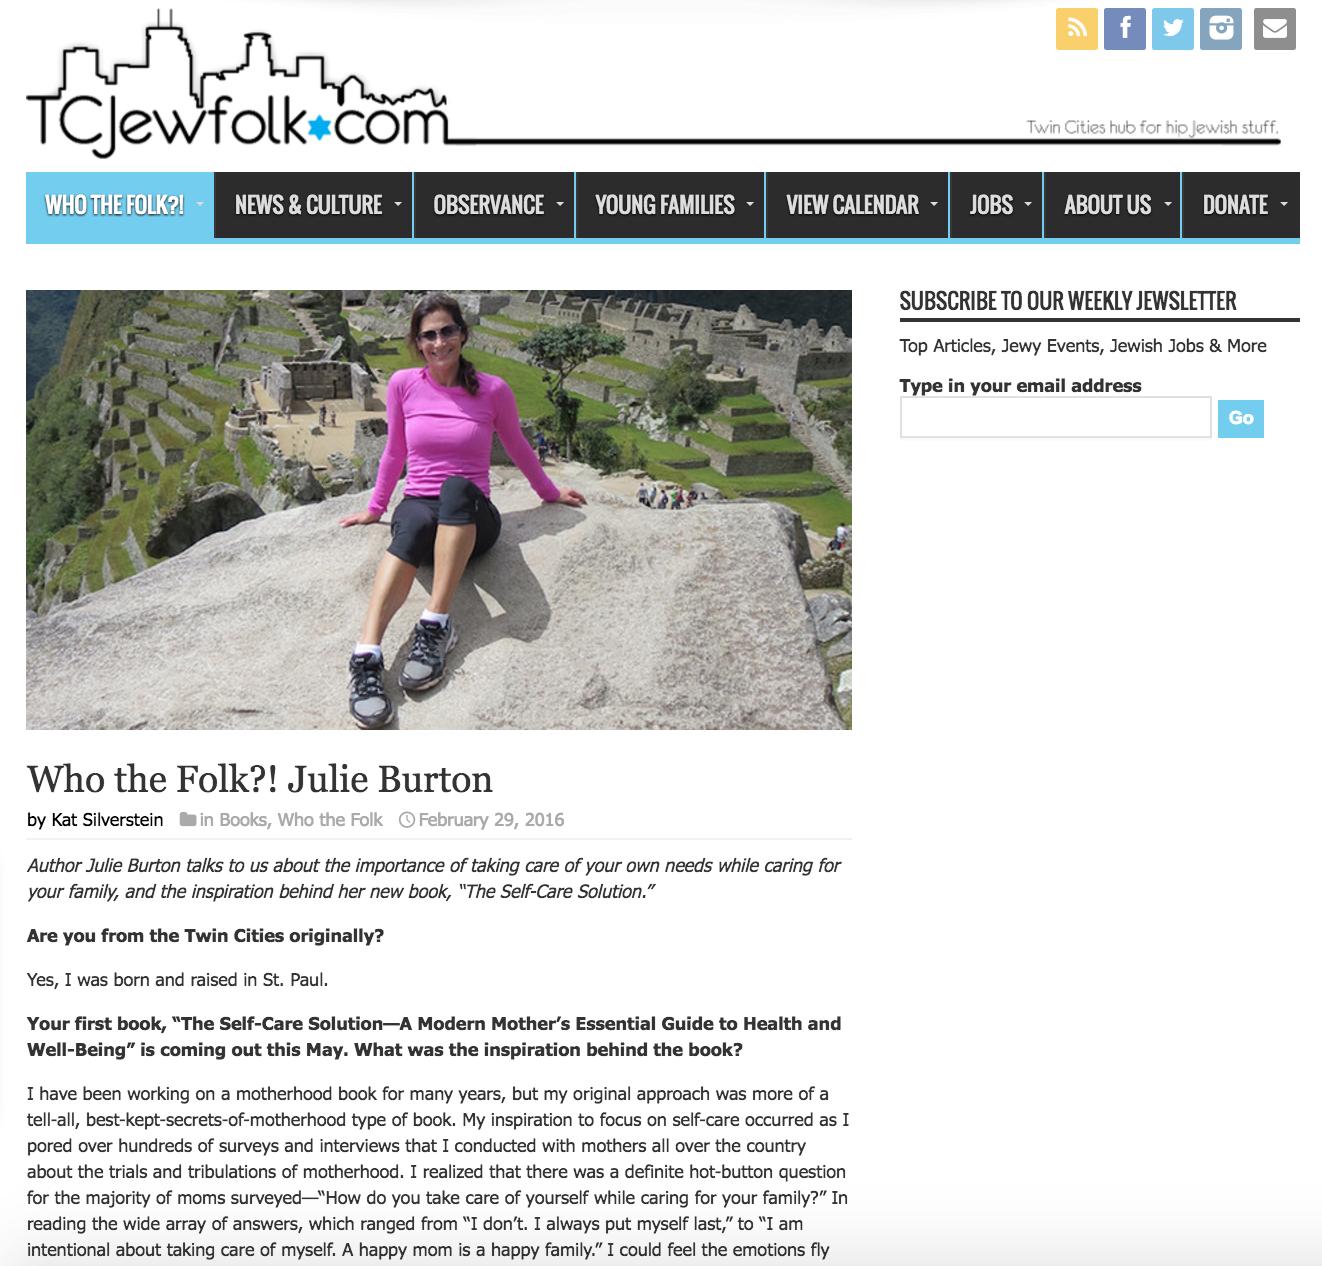 Twin-Cities-Jew-Folk-Julie-Burton-Self-Care-Solution